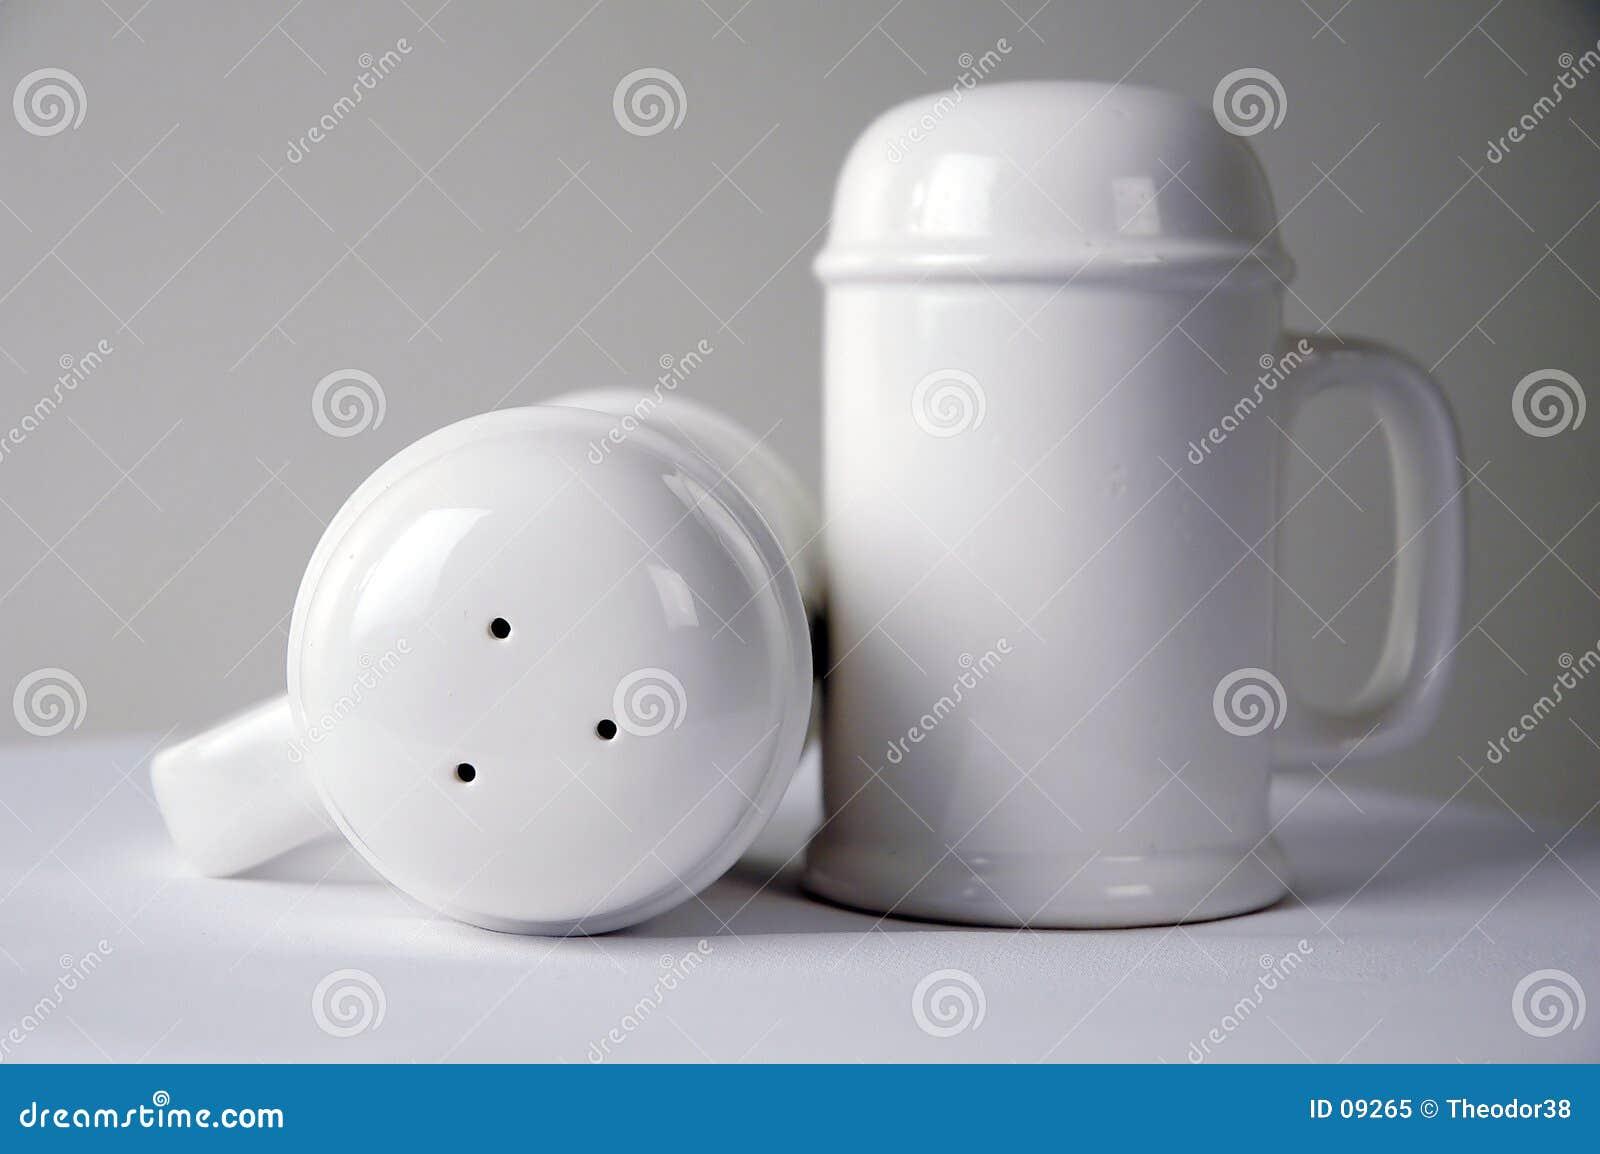 Salt and pepper-2